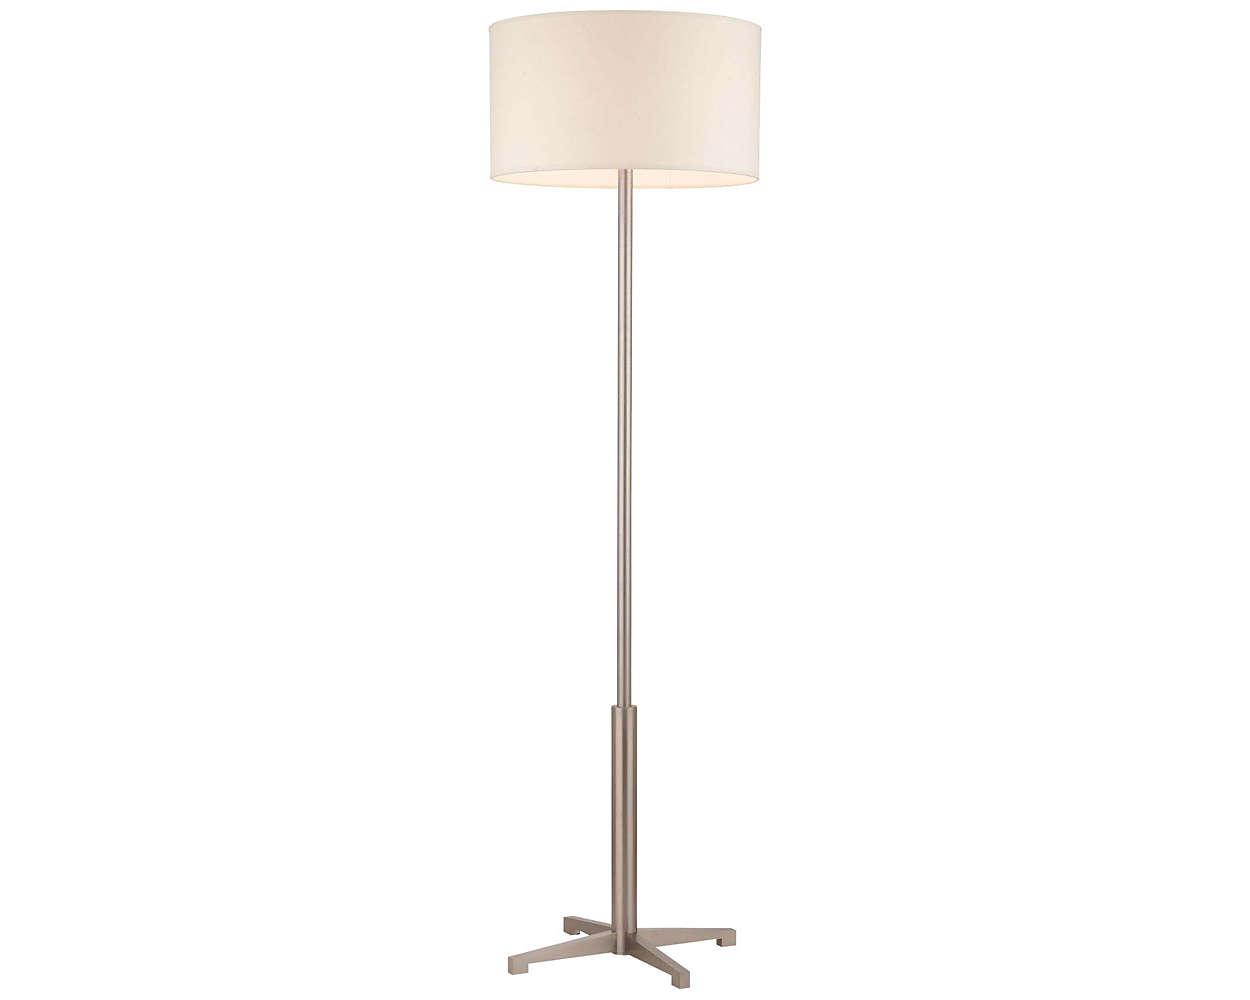 Fisher Island 2-light Floor Lamp, Satin Nickel